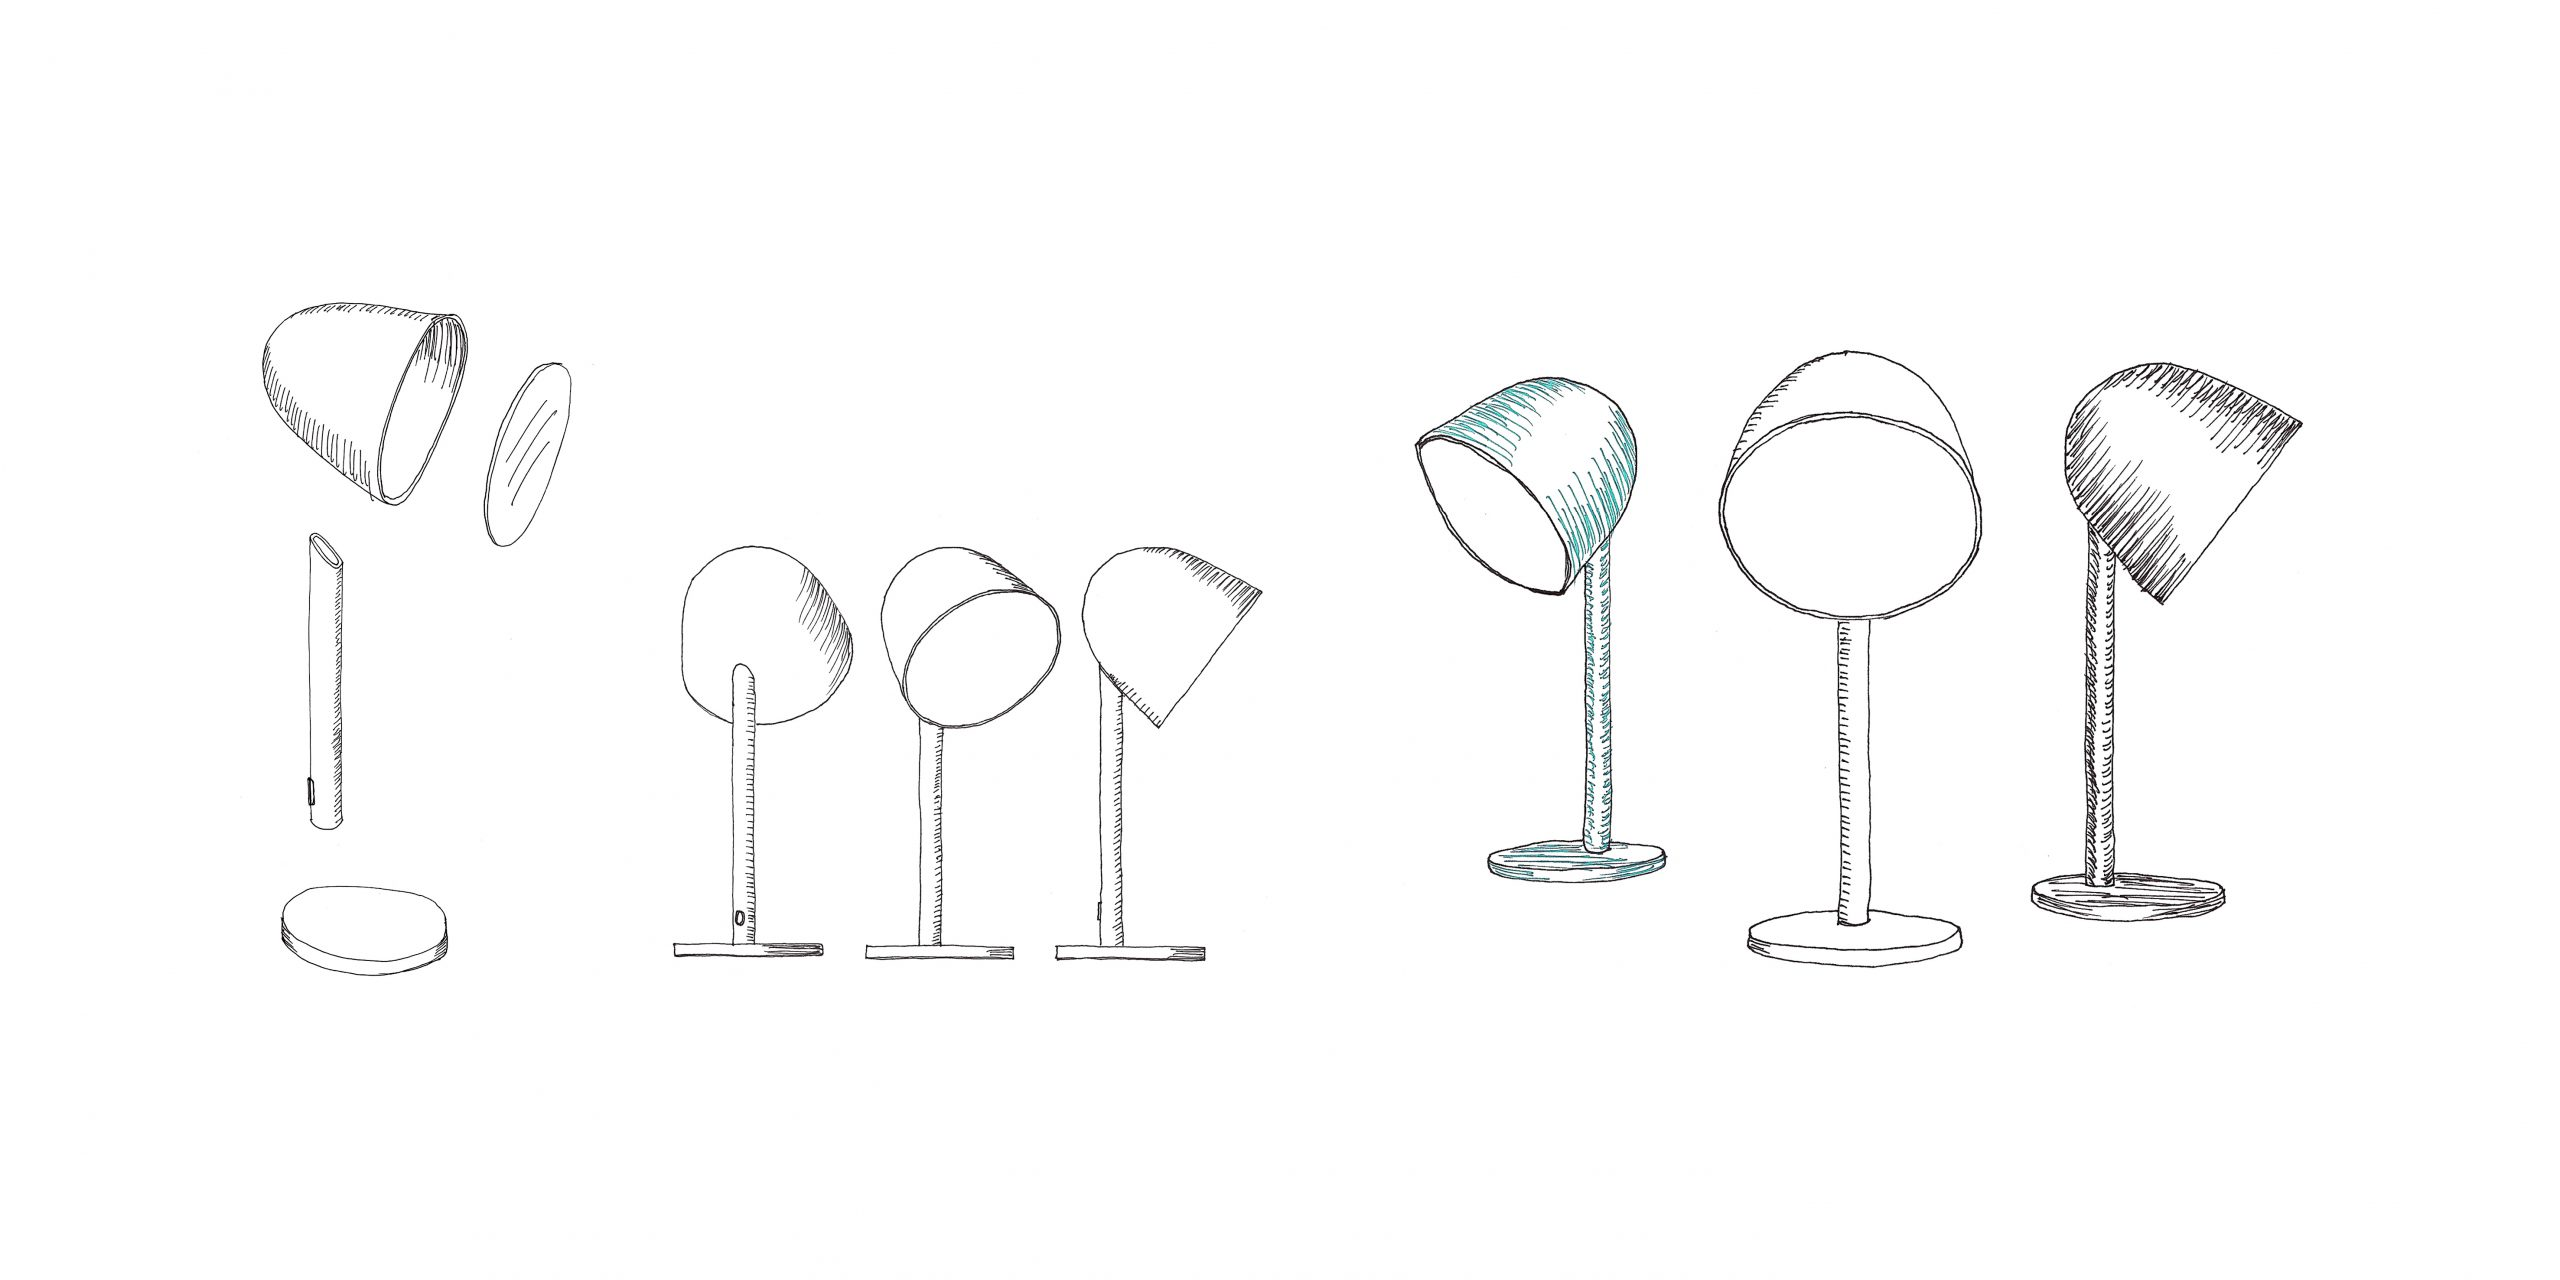 Sketch of Campanule lamp by Debiasi sandri for Ligne Roset